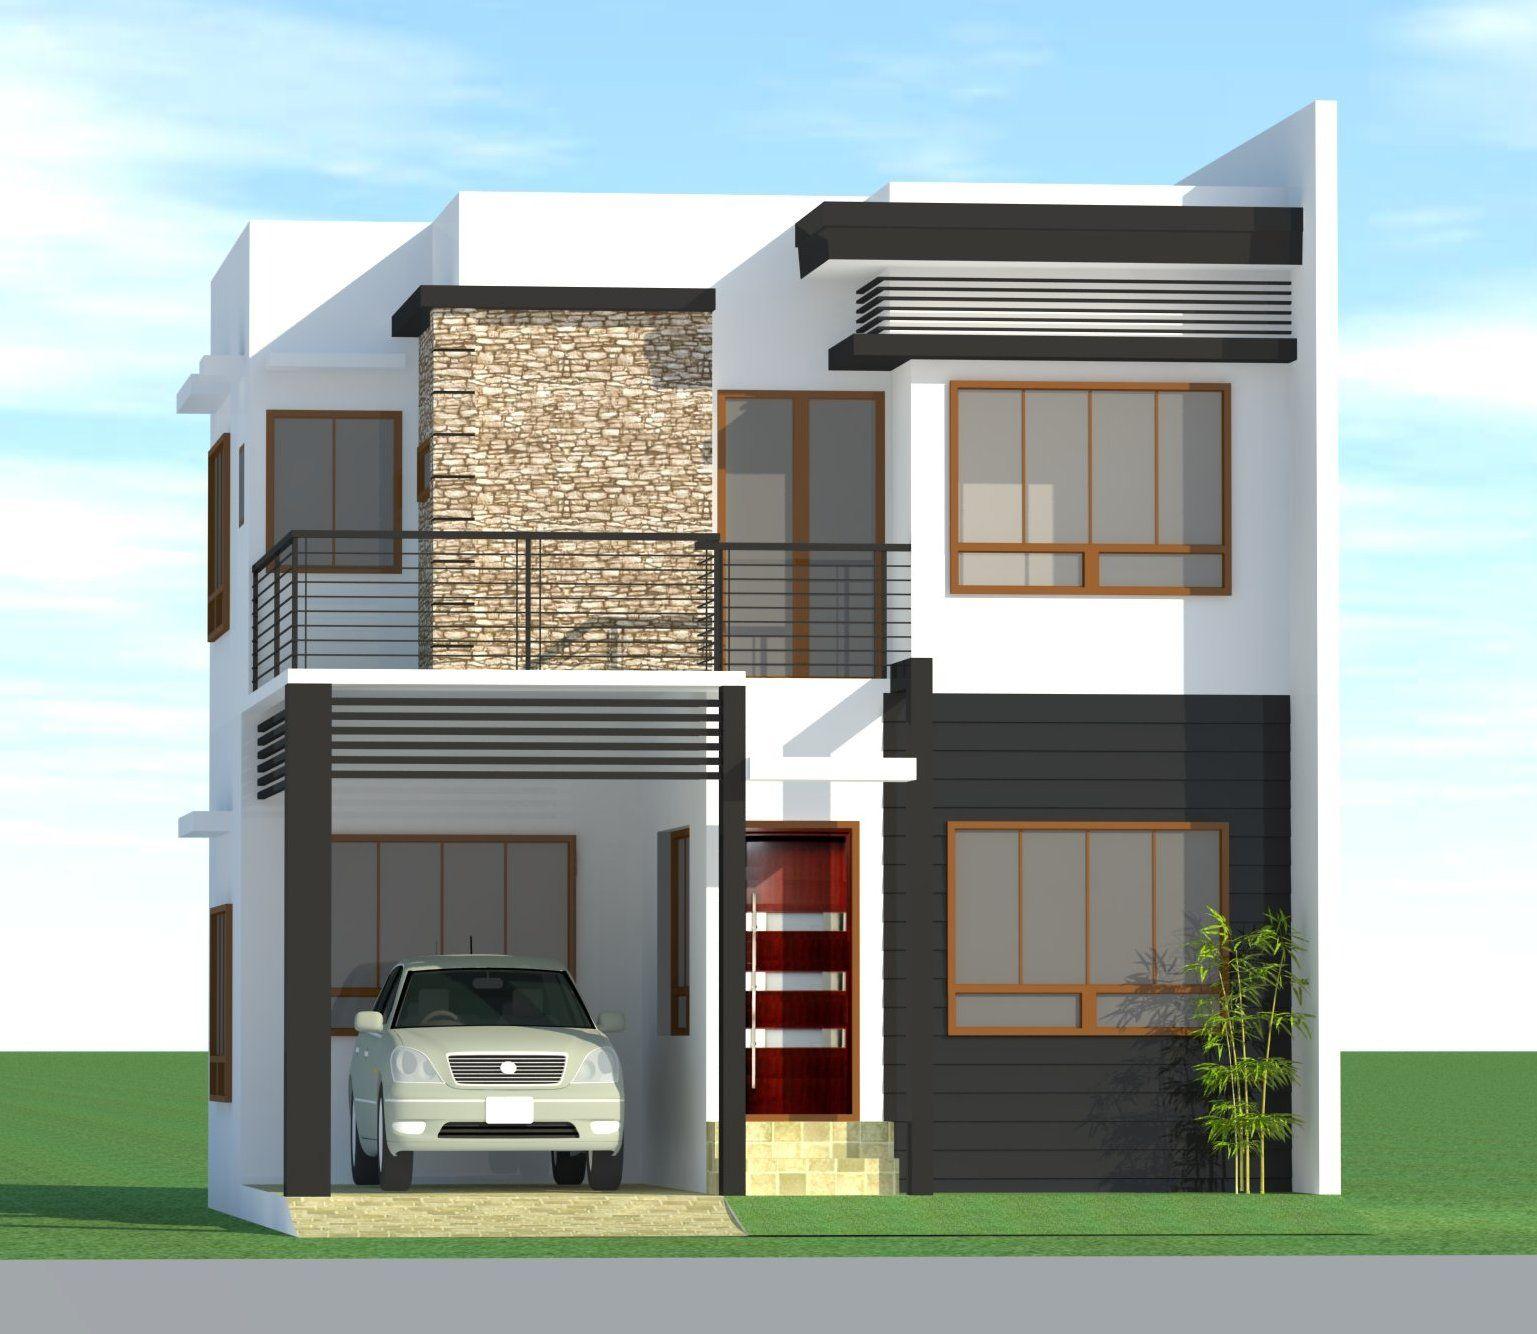 Philippines House Design Images 3 Home Design Ideas Duplex House